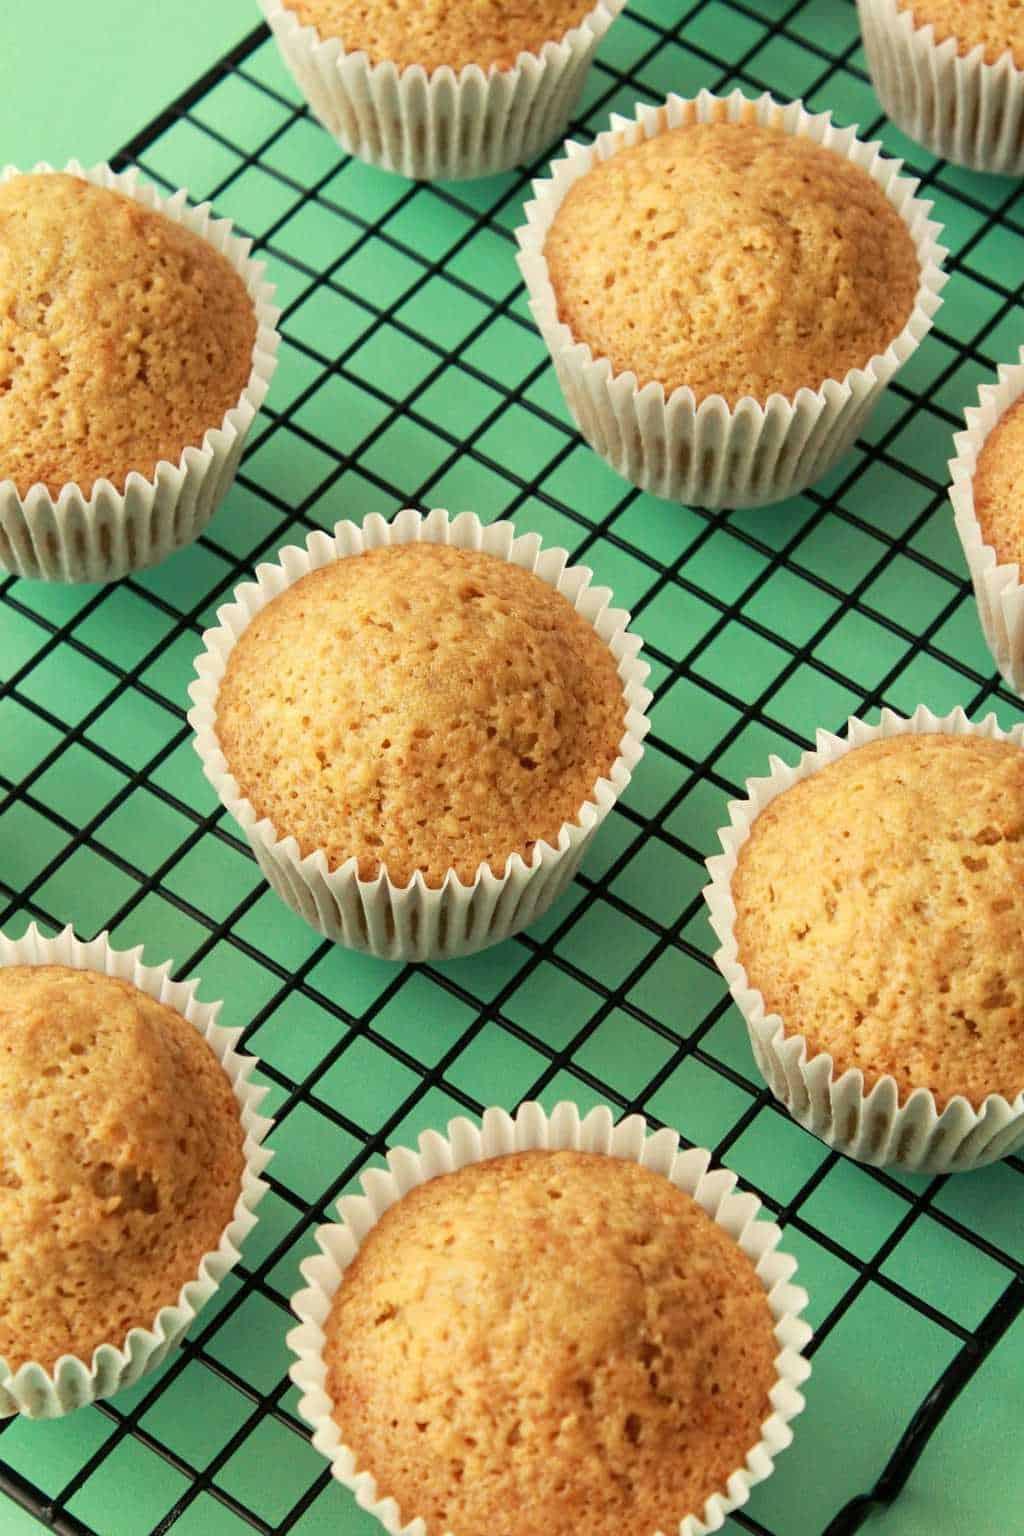 Vegan lemon cupcakes freshly baked on a wire cooling rack.